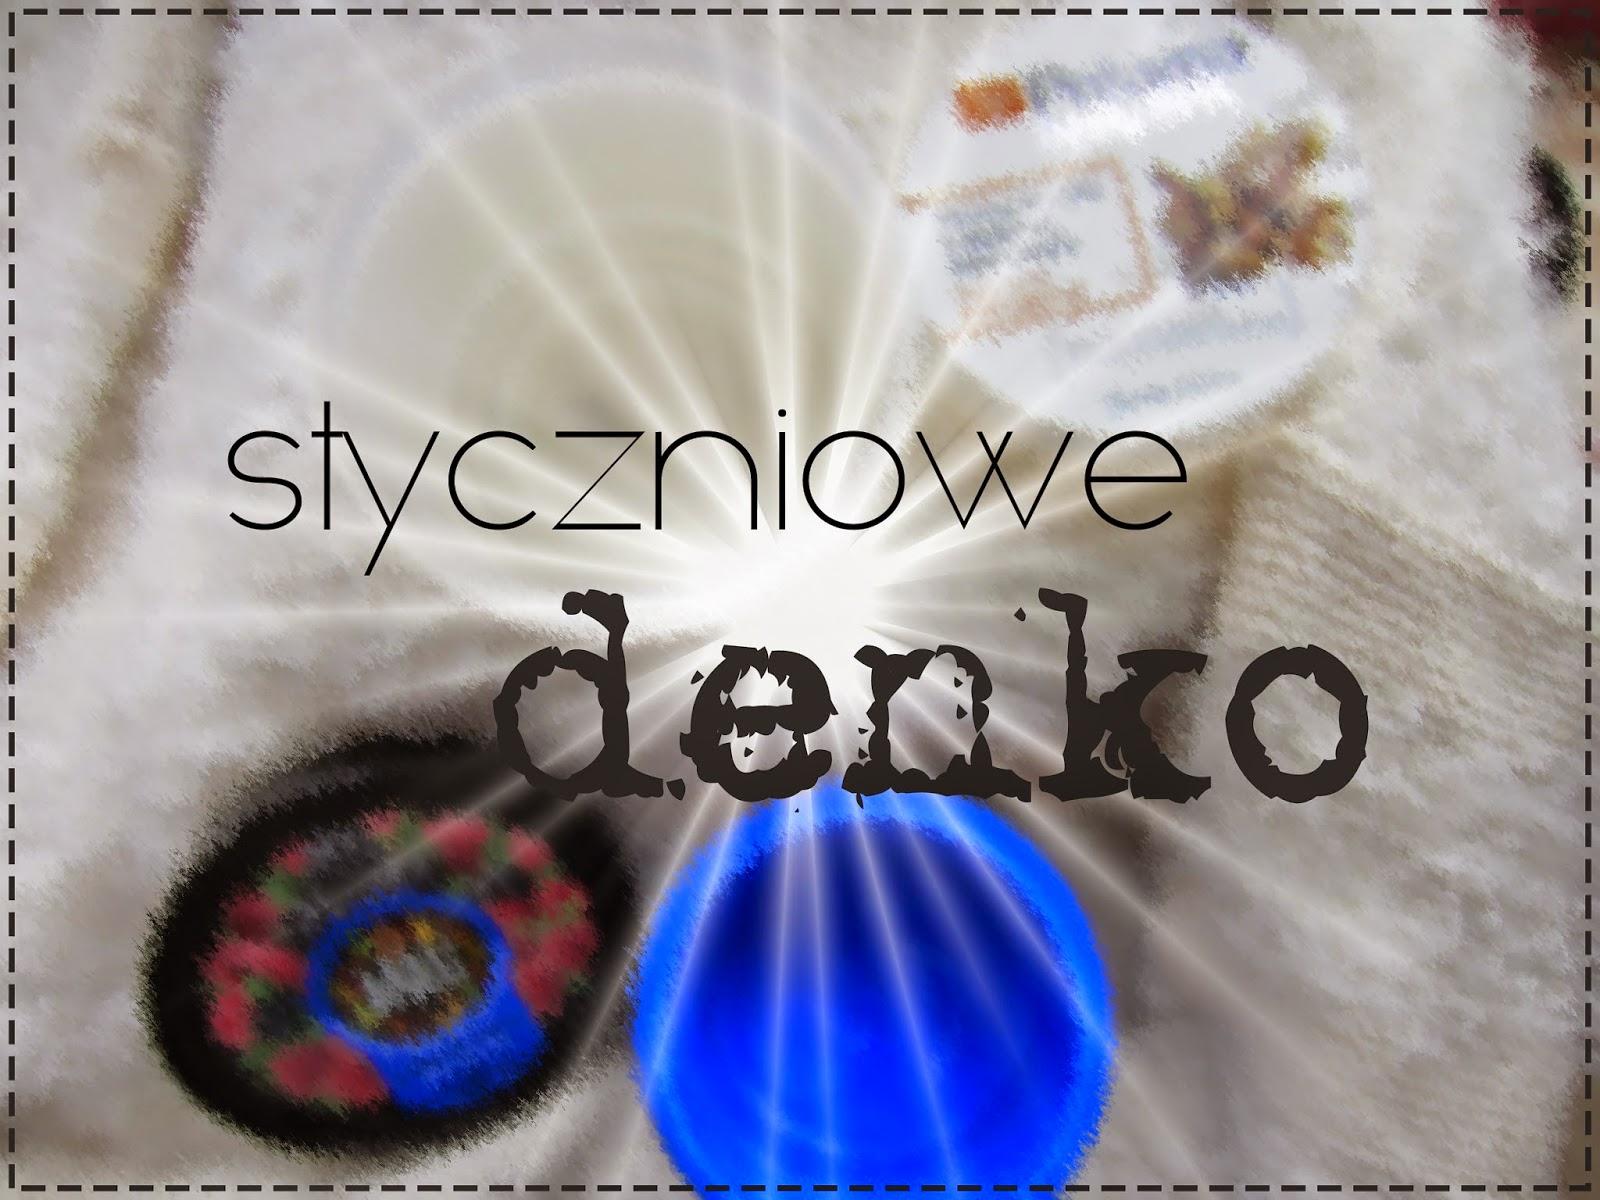 DENKO: STYCZEŃ 2015